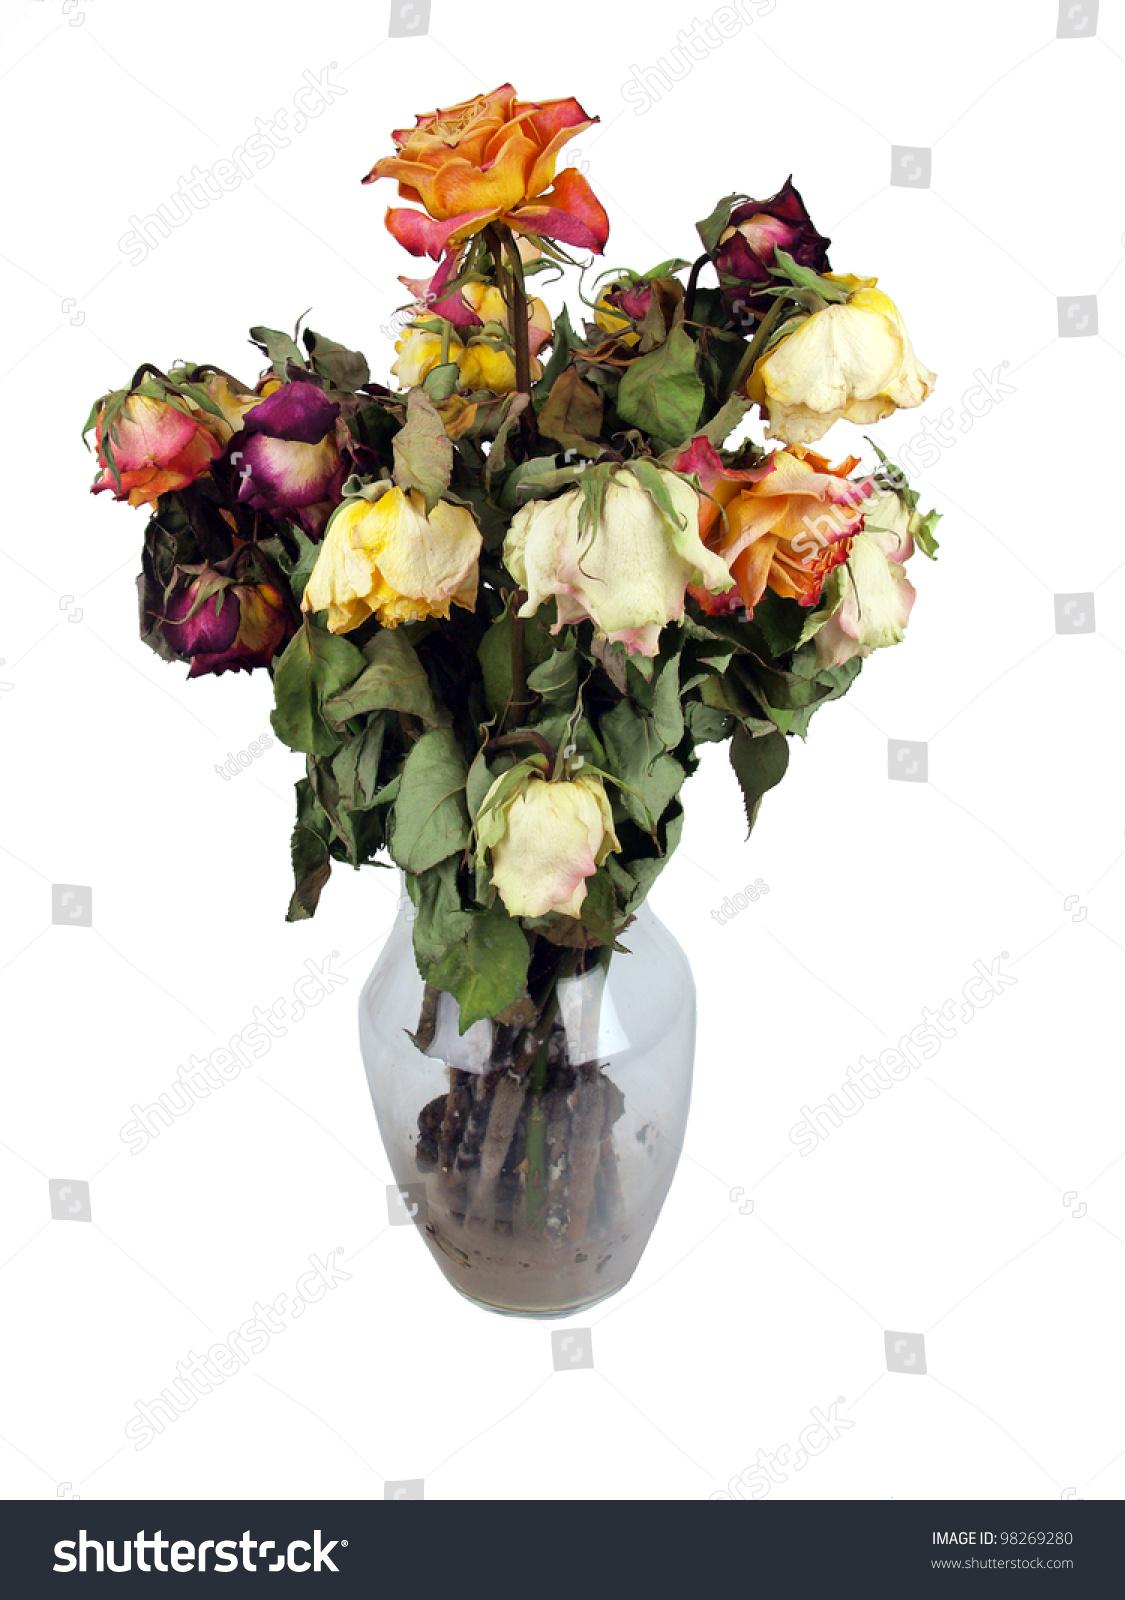 Bouquet Dead Roses Clear Glass Vase Stock Photo Edit Now 98269280